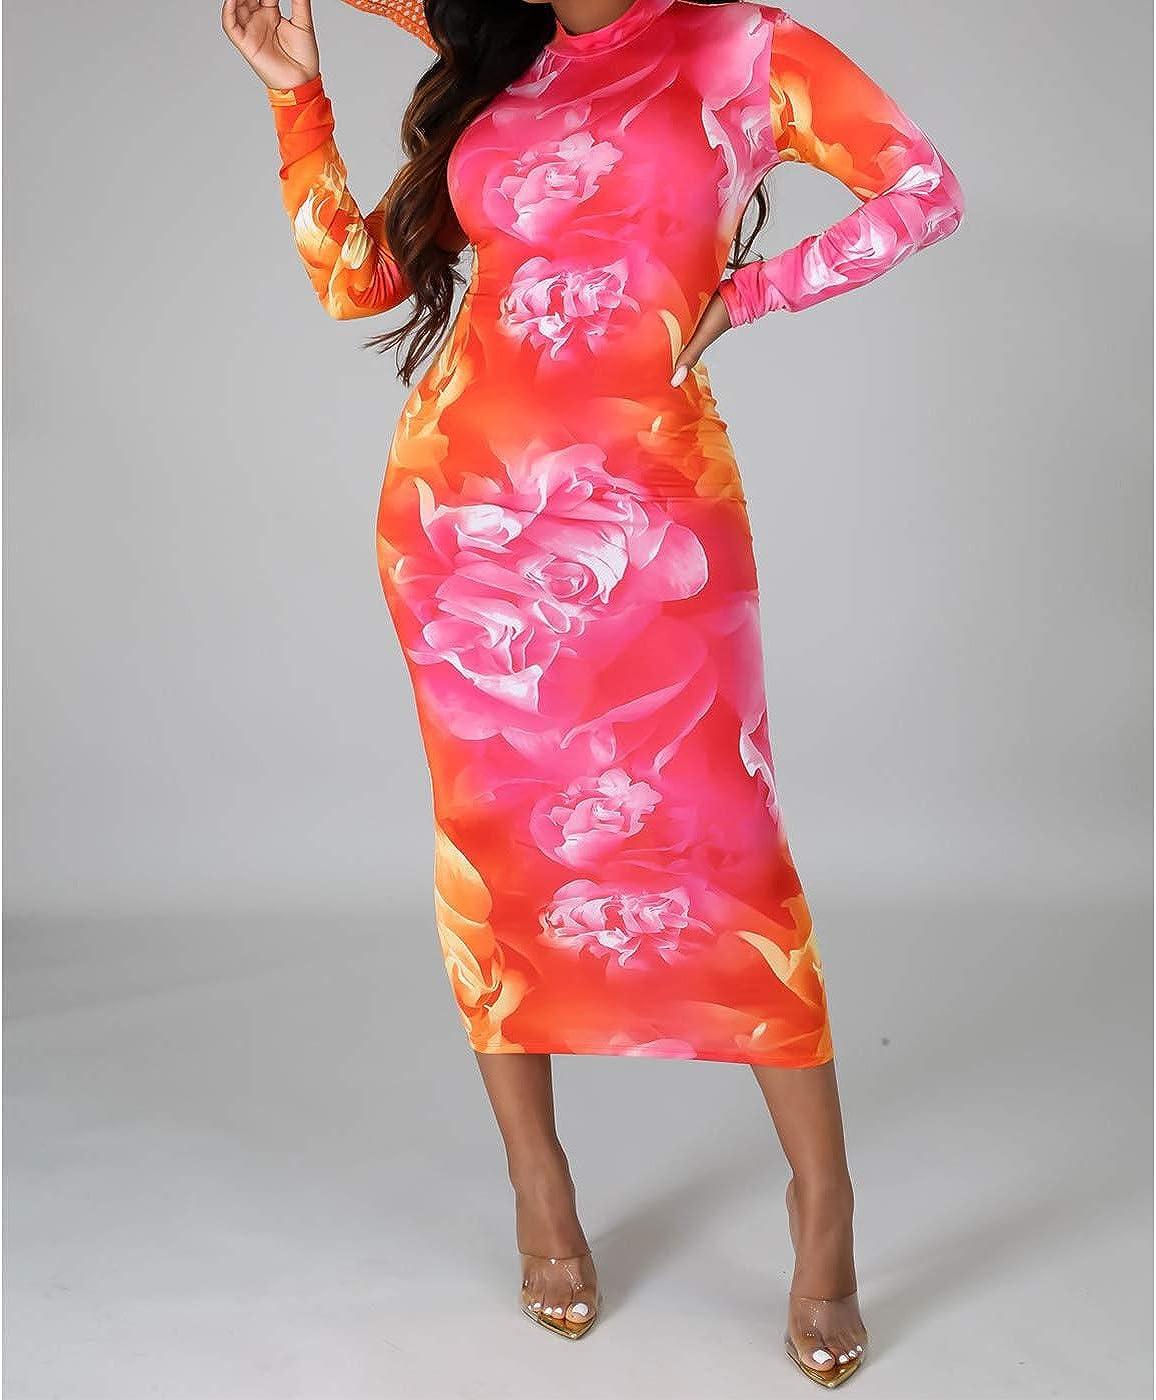 Women's Sexy Bodycon Dresses - High Neck Long Sleeve Leopard Print Tunic Long Maxi Pencil Dress